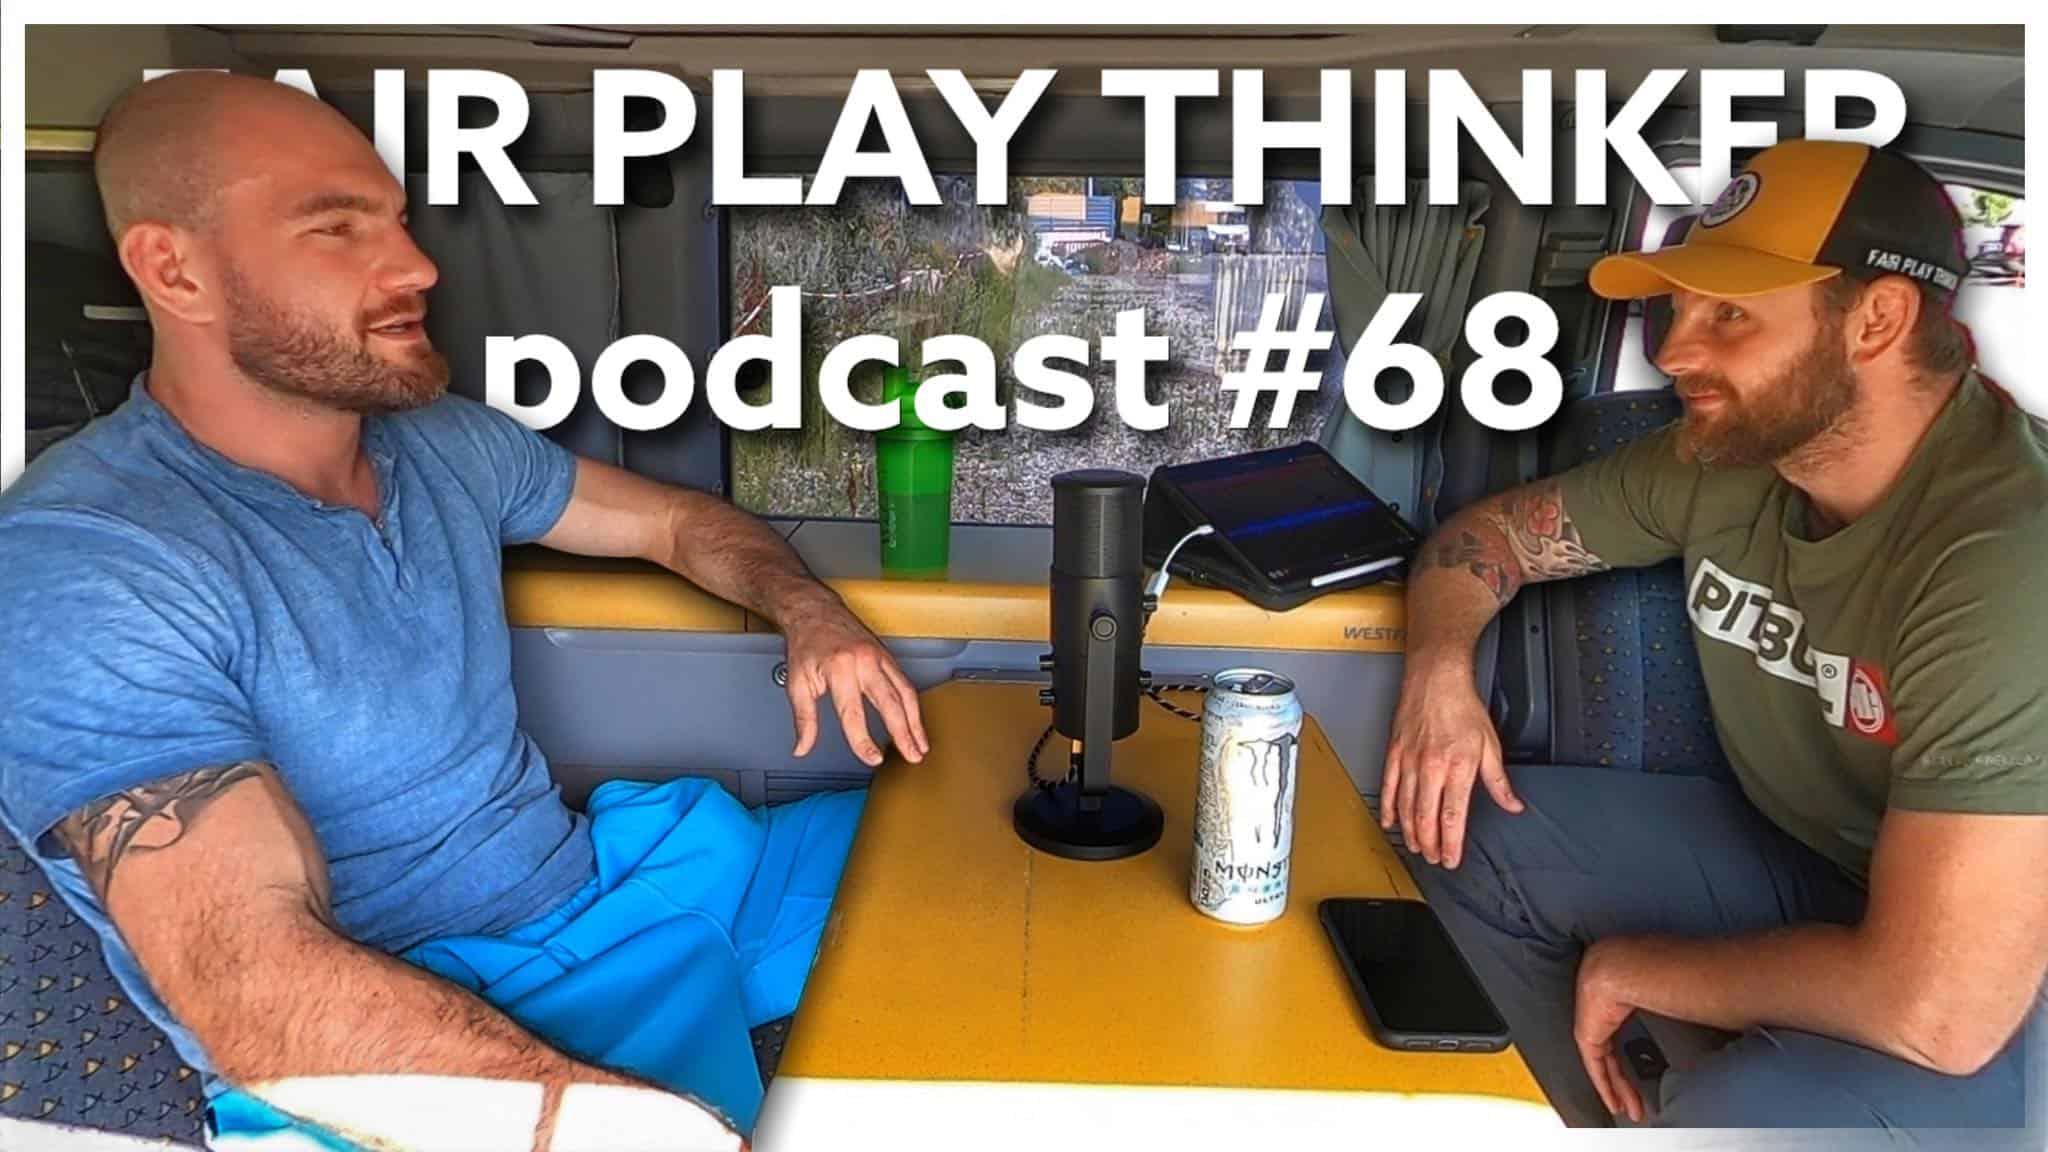 Škvor, Fair play thinker podcast